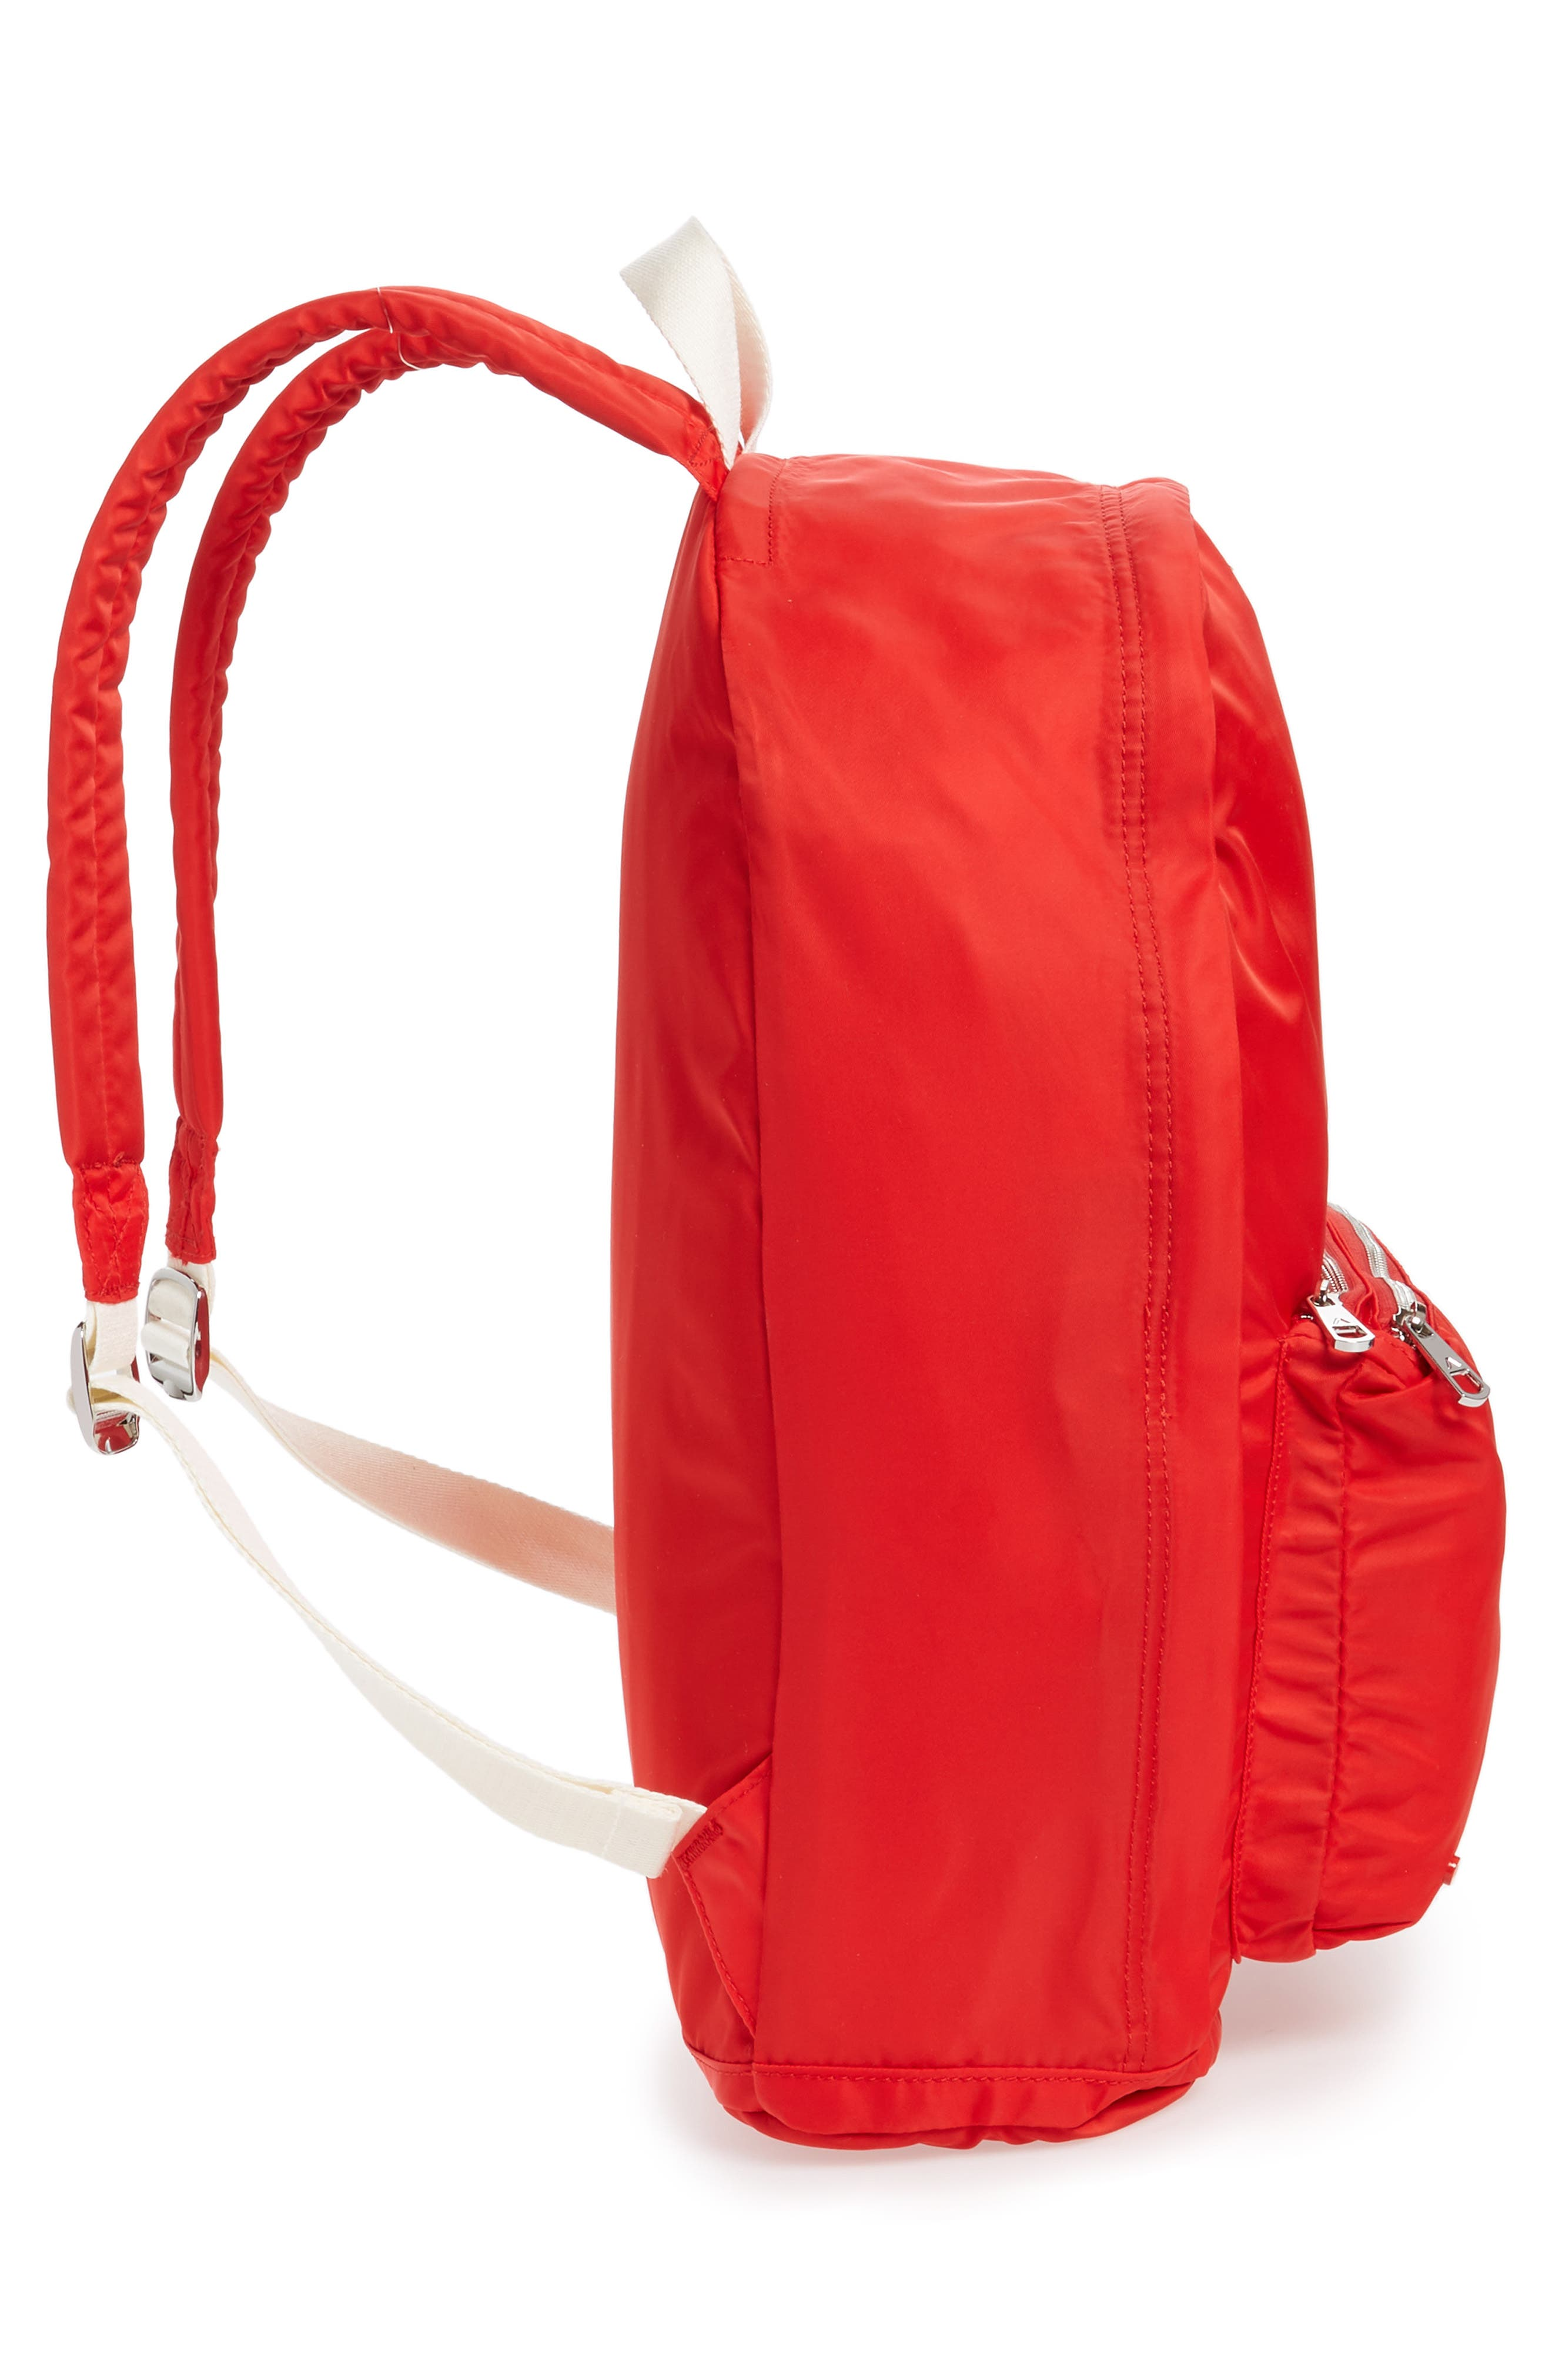 Heights Lorimer Nylon Backpack,                             Alternate thumbnail 5, color,                             600